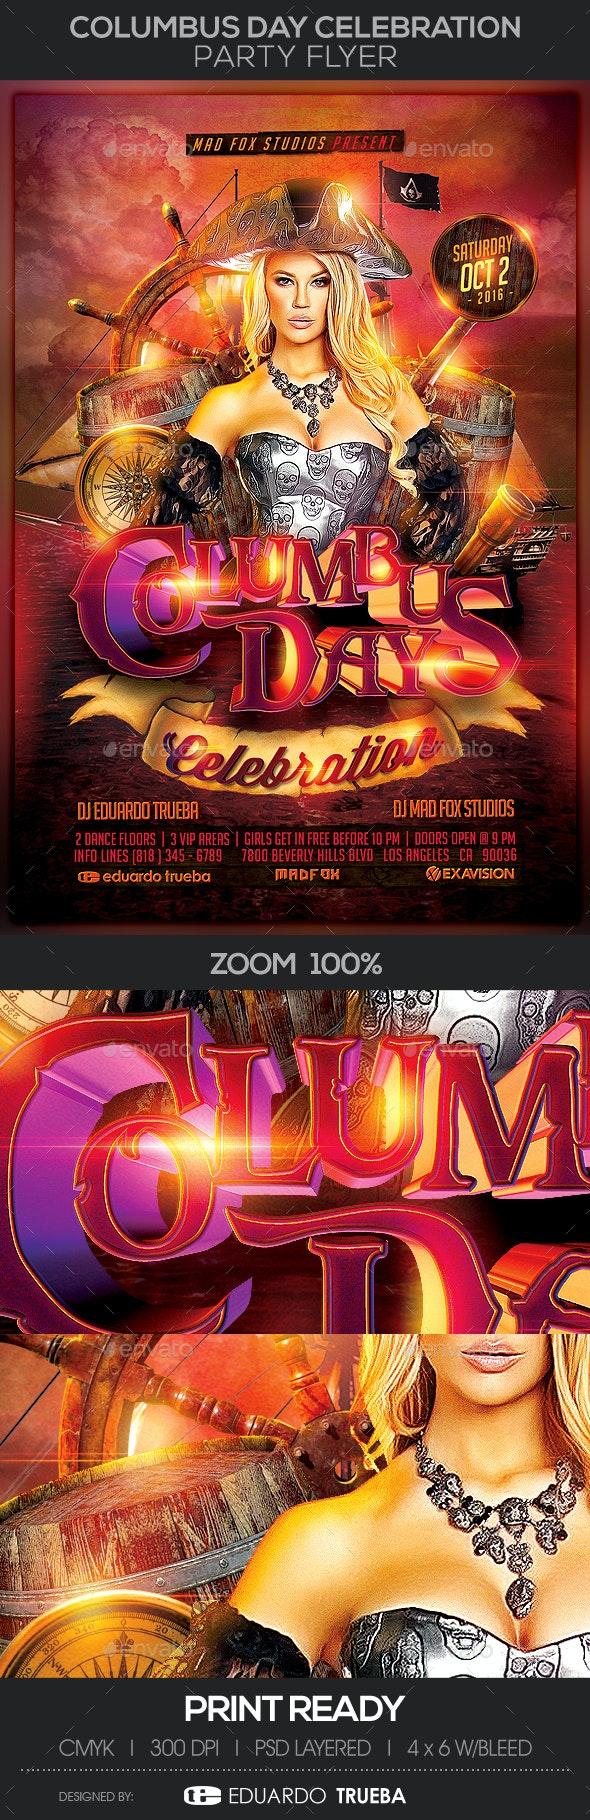 Columbus Day Celebration Party Flyer - Events Flyers